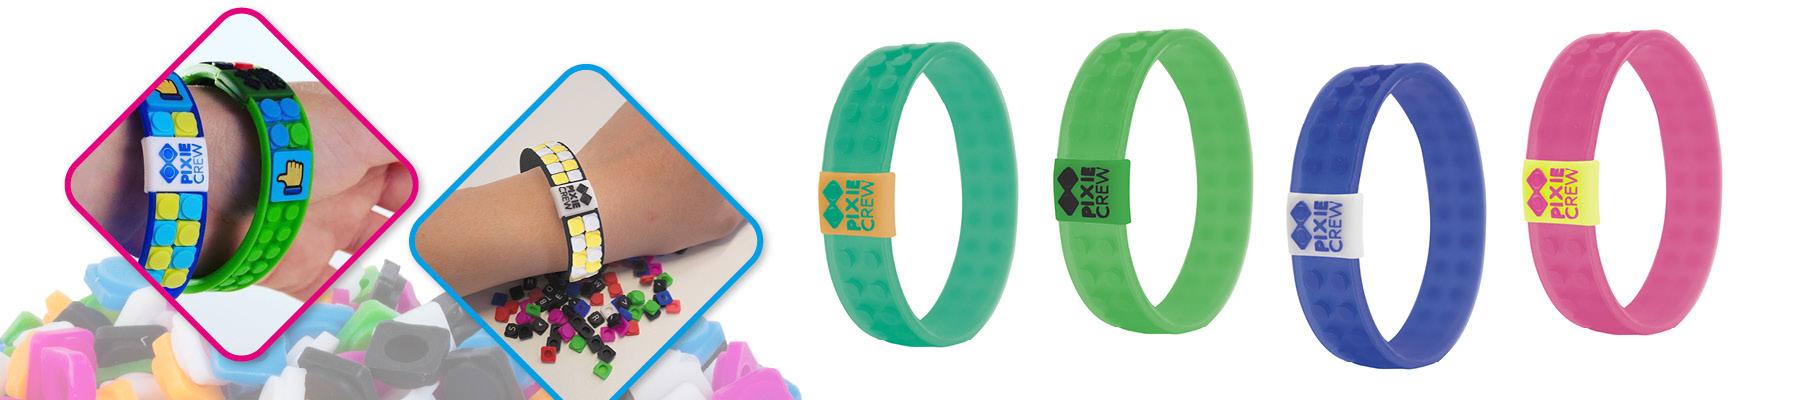 Pixie Crew - Pixie Armbänder